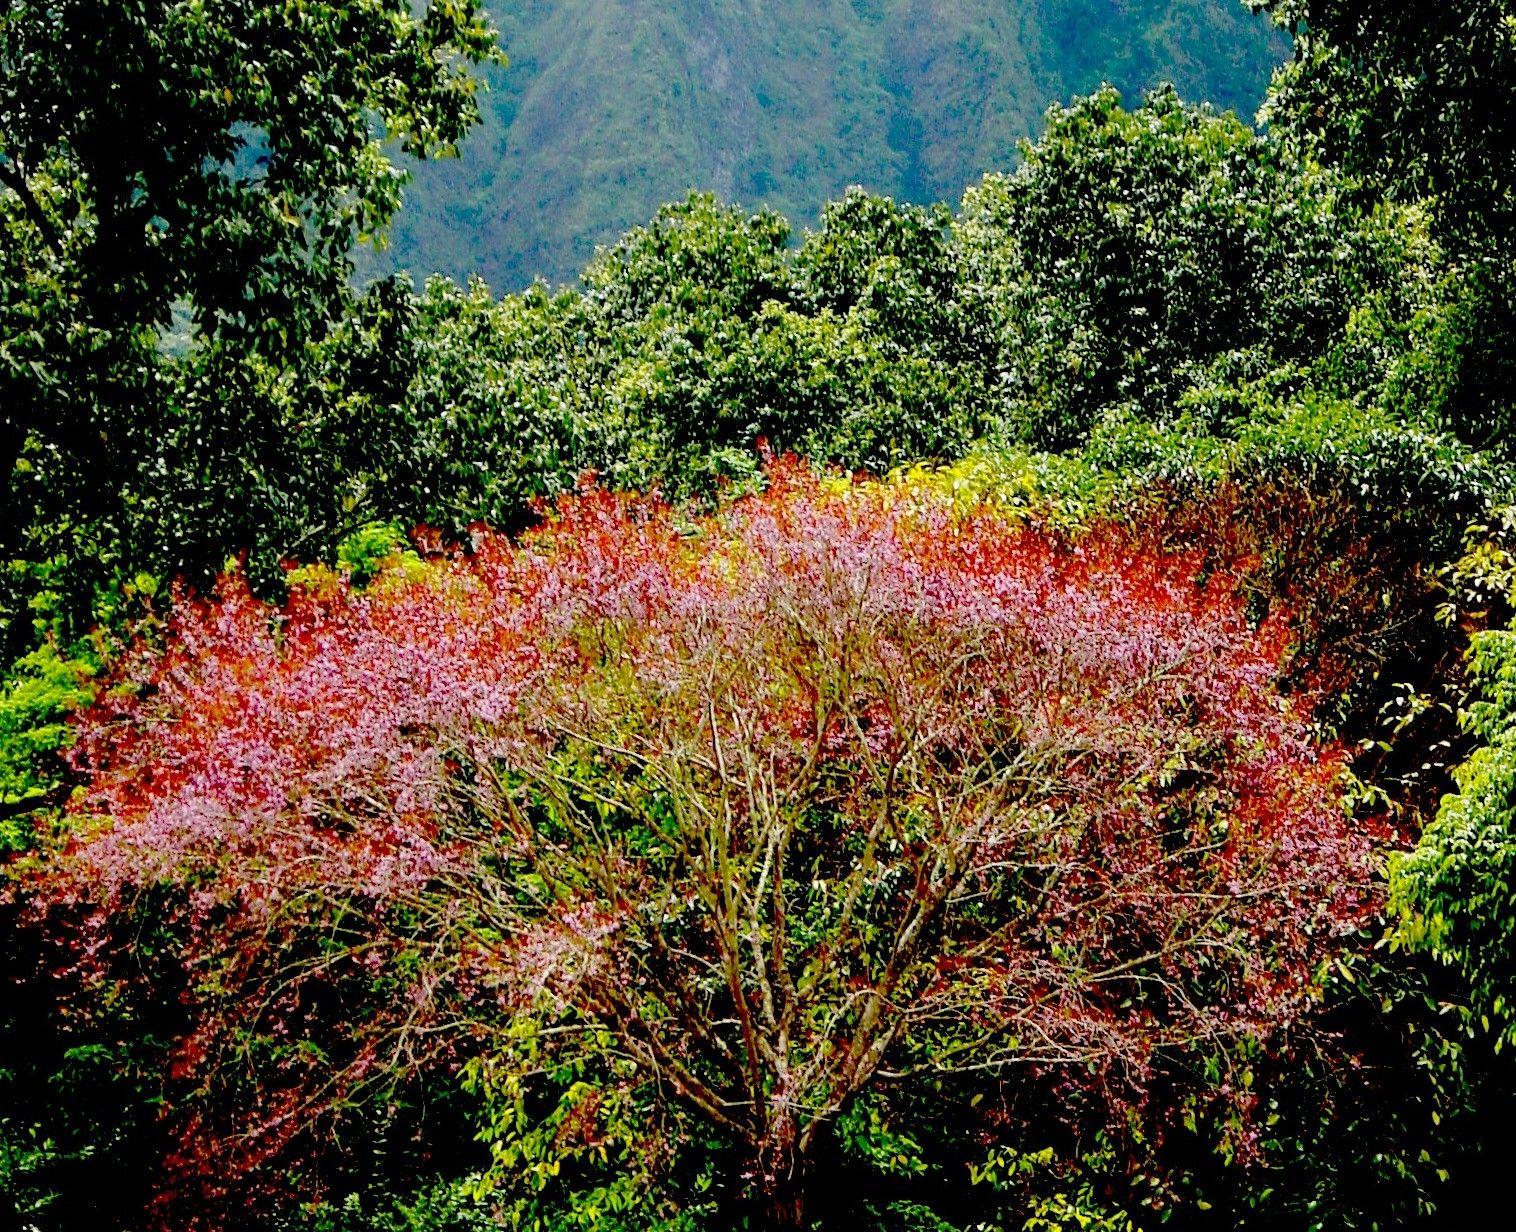 Hoomaluhia Park, Hawaii | My Photographs | Pinterest | Hawaii, Park ...